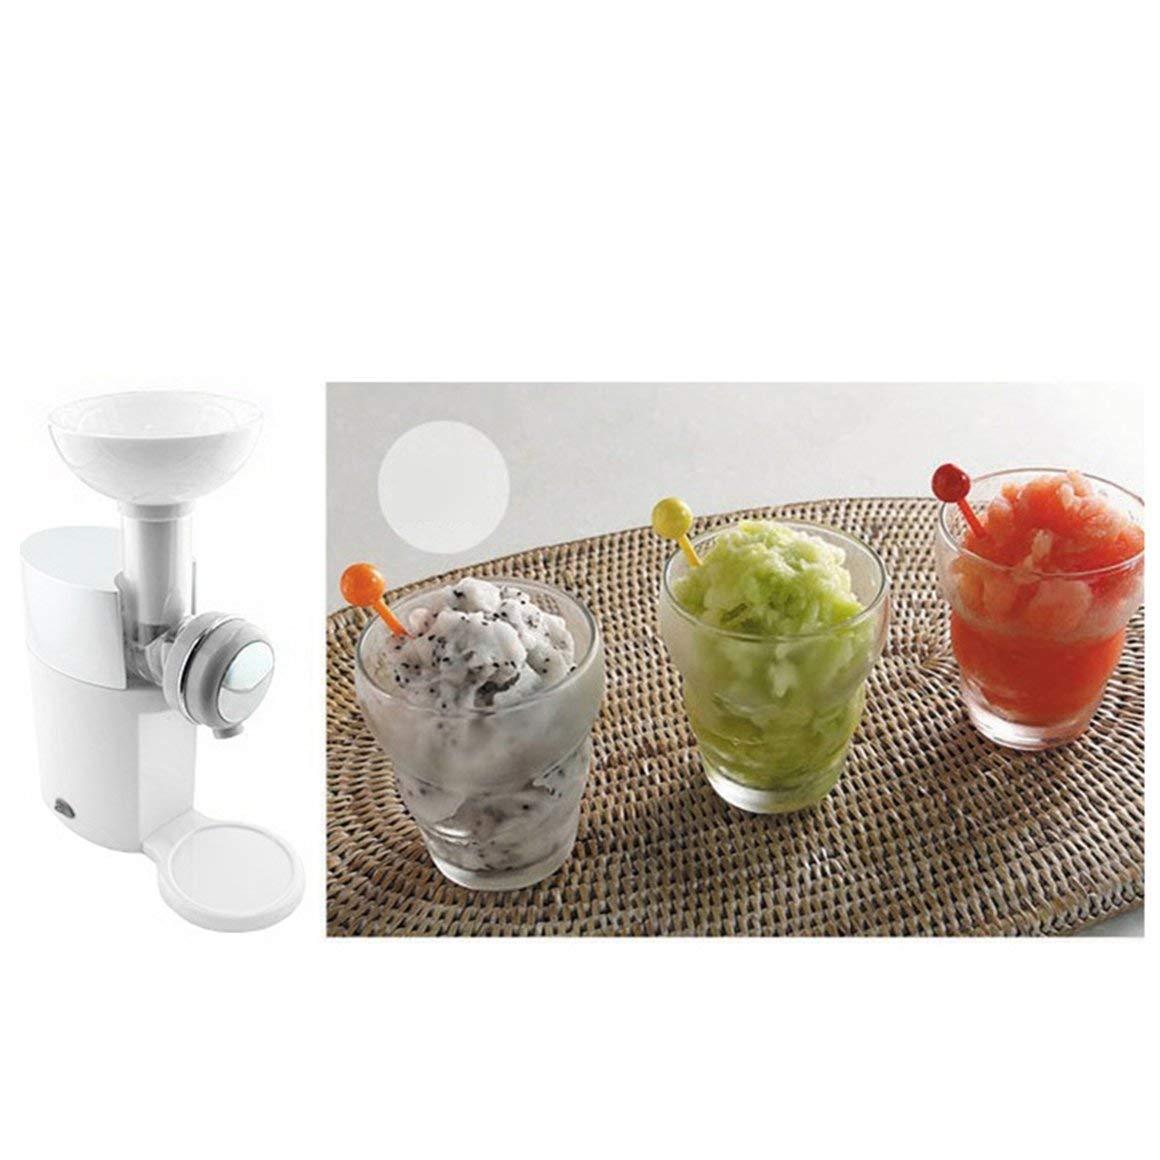 bianca Funnyrunstore Macchina per gelato artigianale FAI DA TE Macchina automatica per dessert frutta congelata portatile